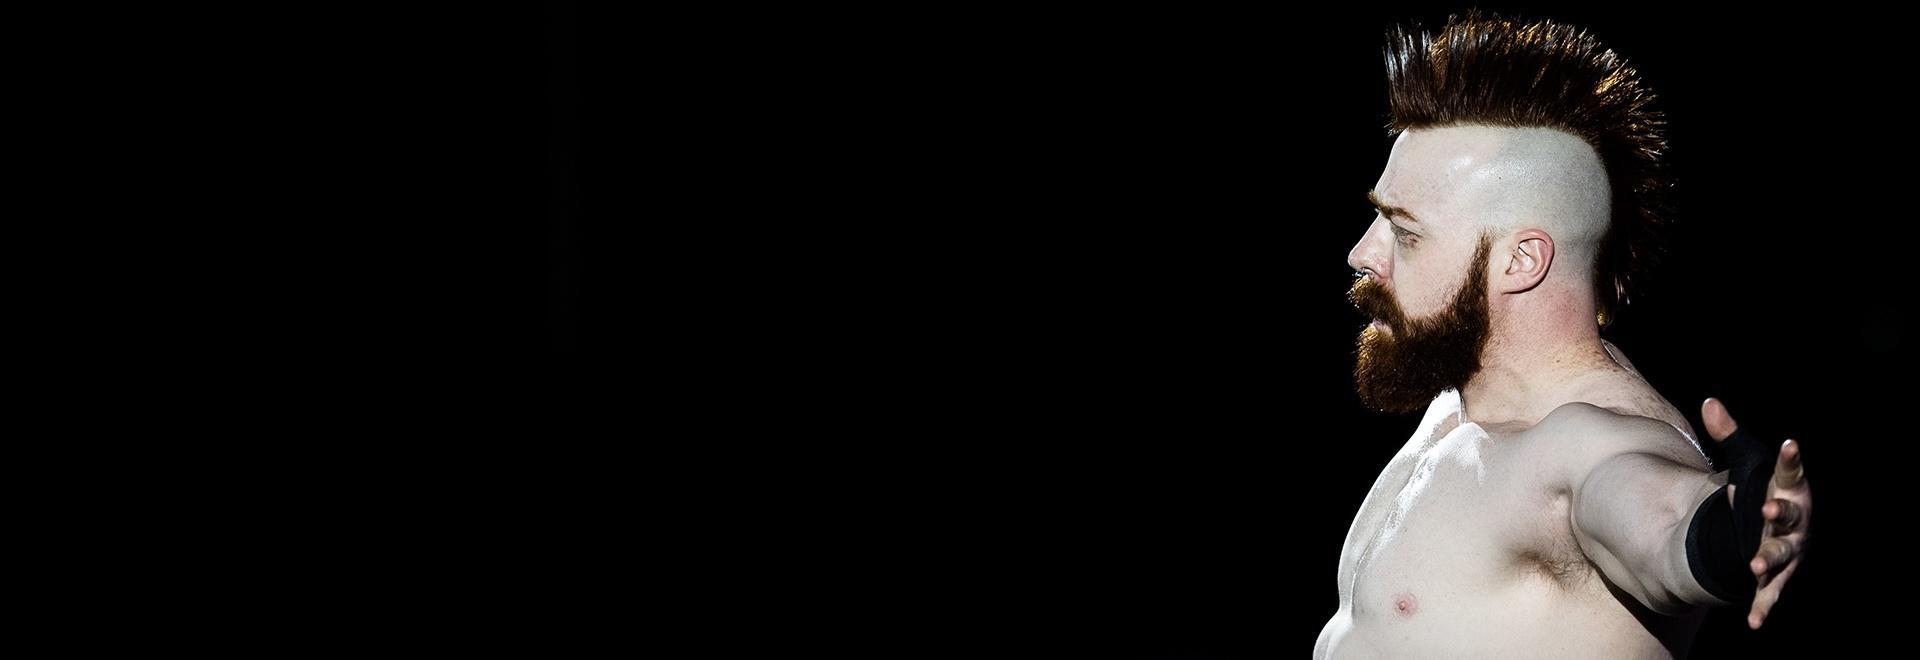 Ep. 51